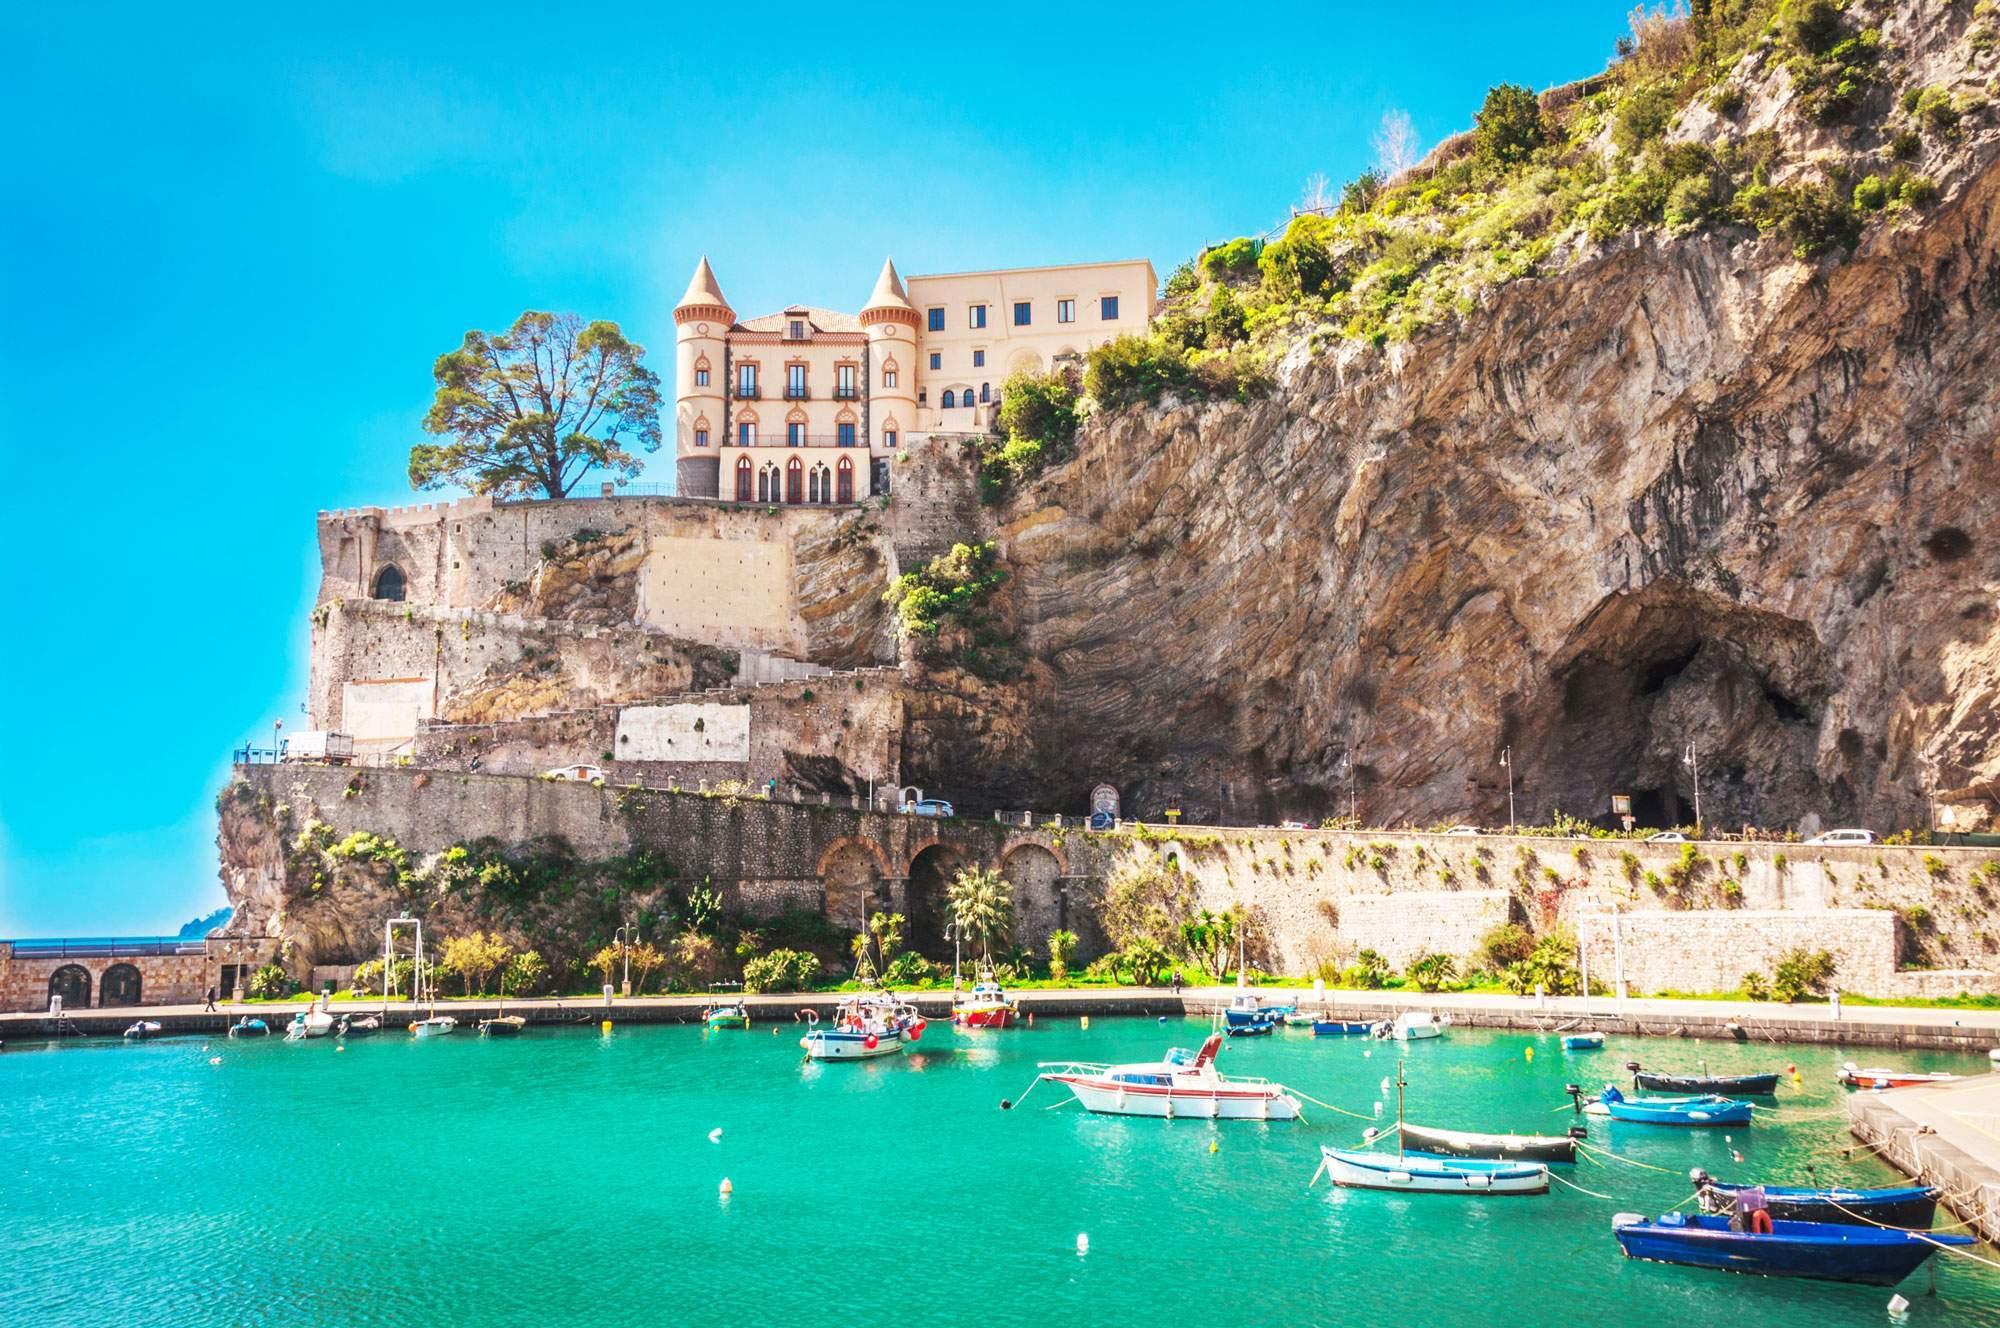 maiori-amalfi-coast-italy-torre-tower